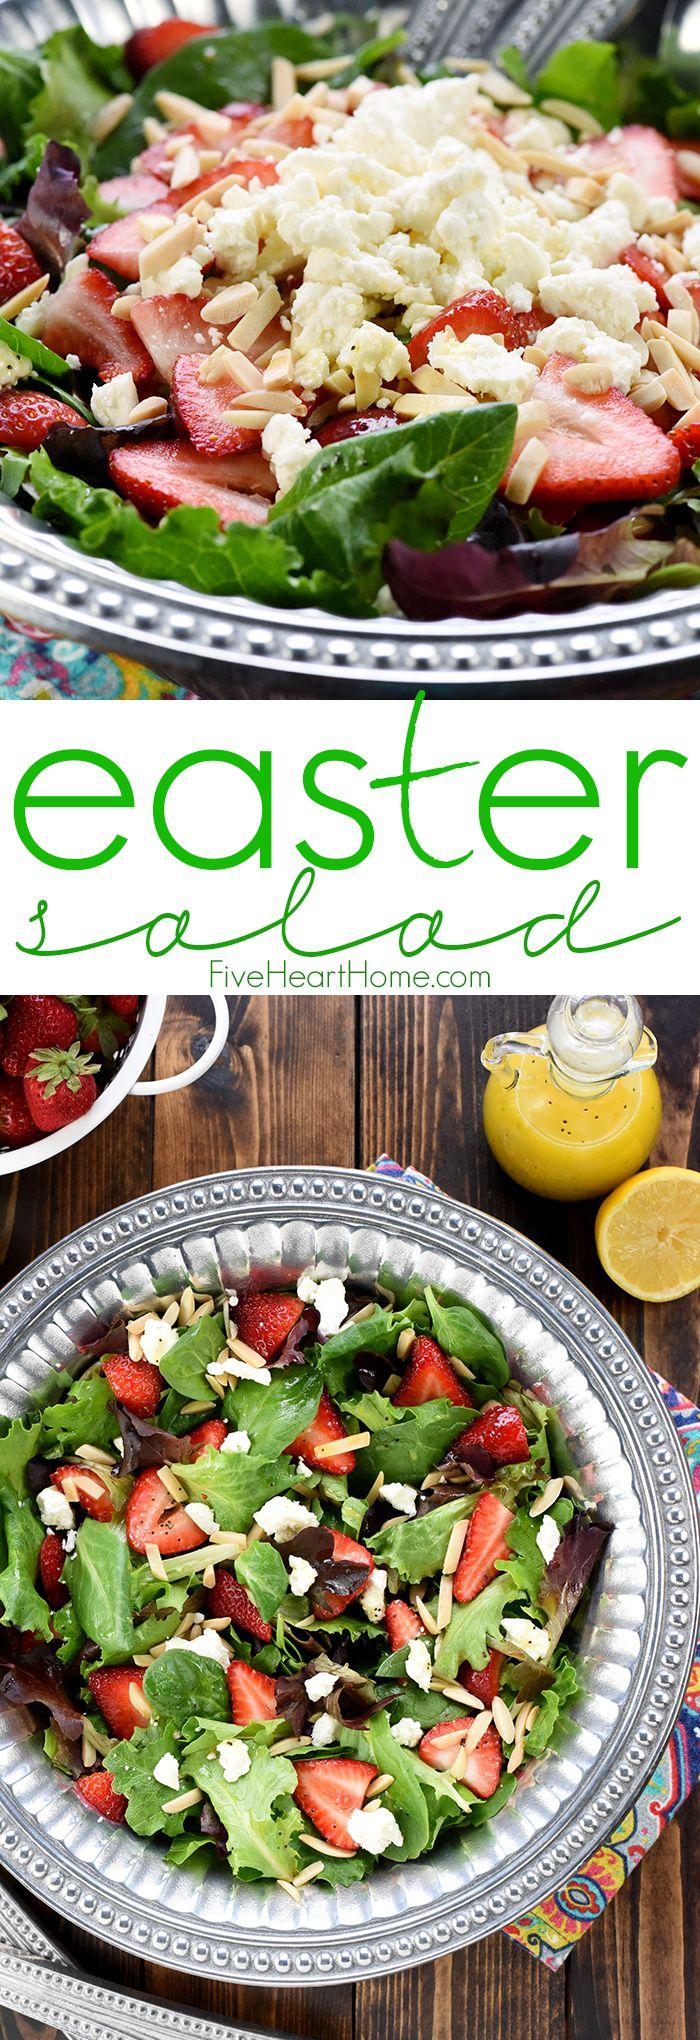 Easter Salad ~ AKA, Strawberry Goat Cheese Salad with Lemon Honey Vinaigrette   FIVEheartHOME   Bloglovin'